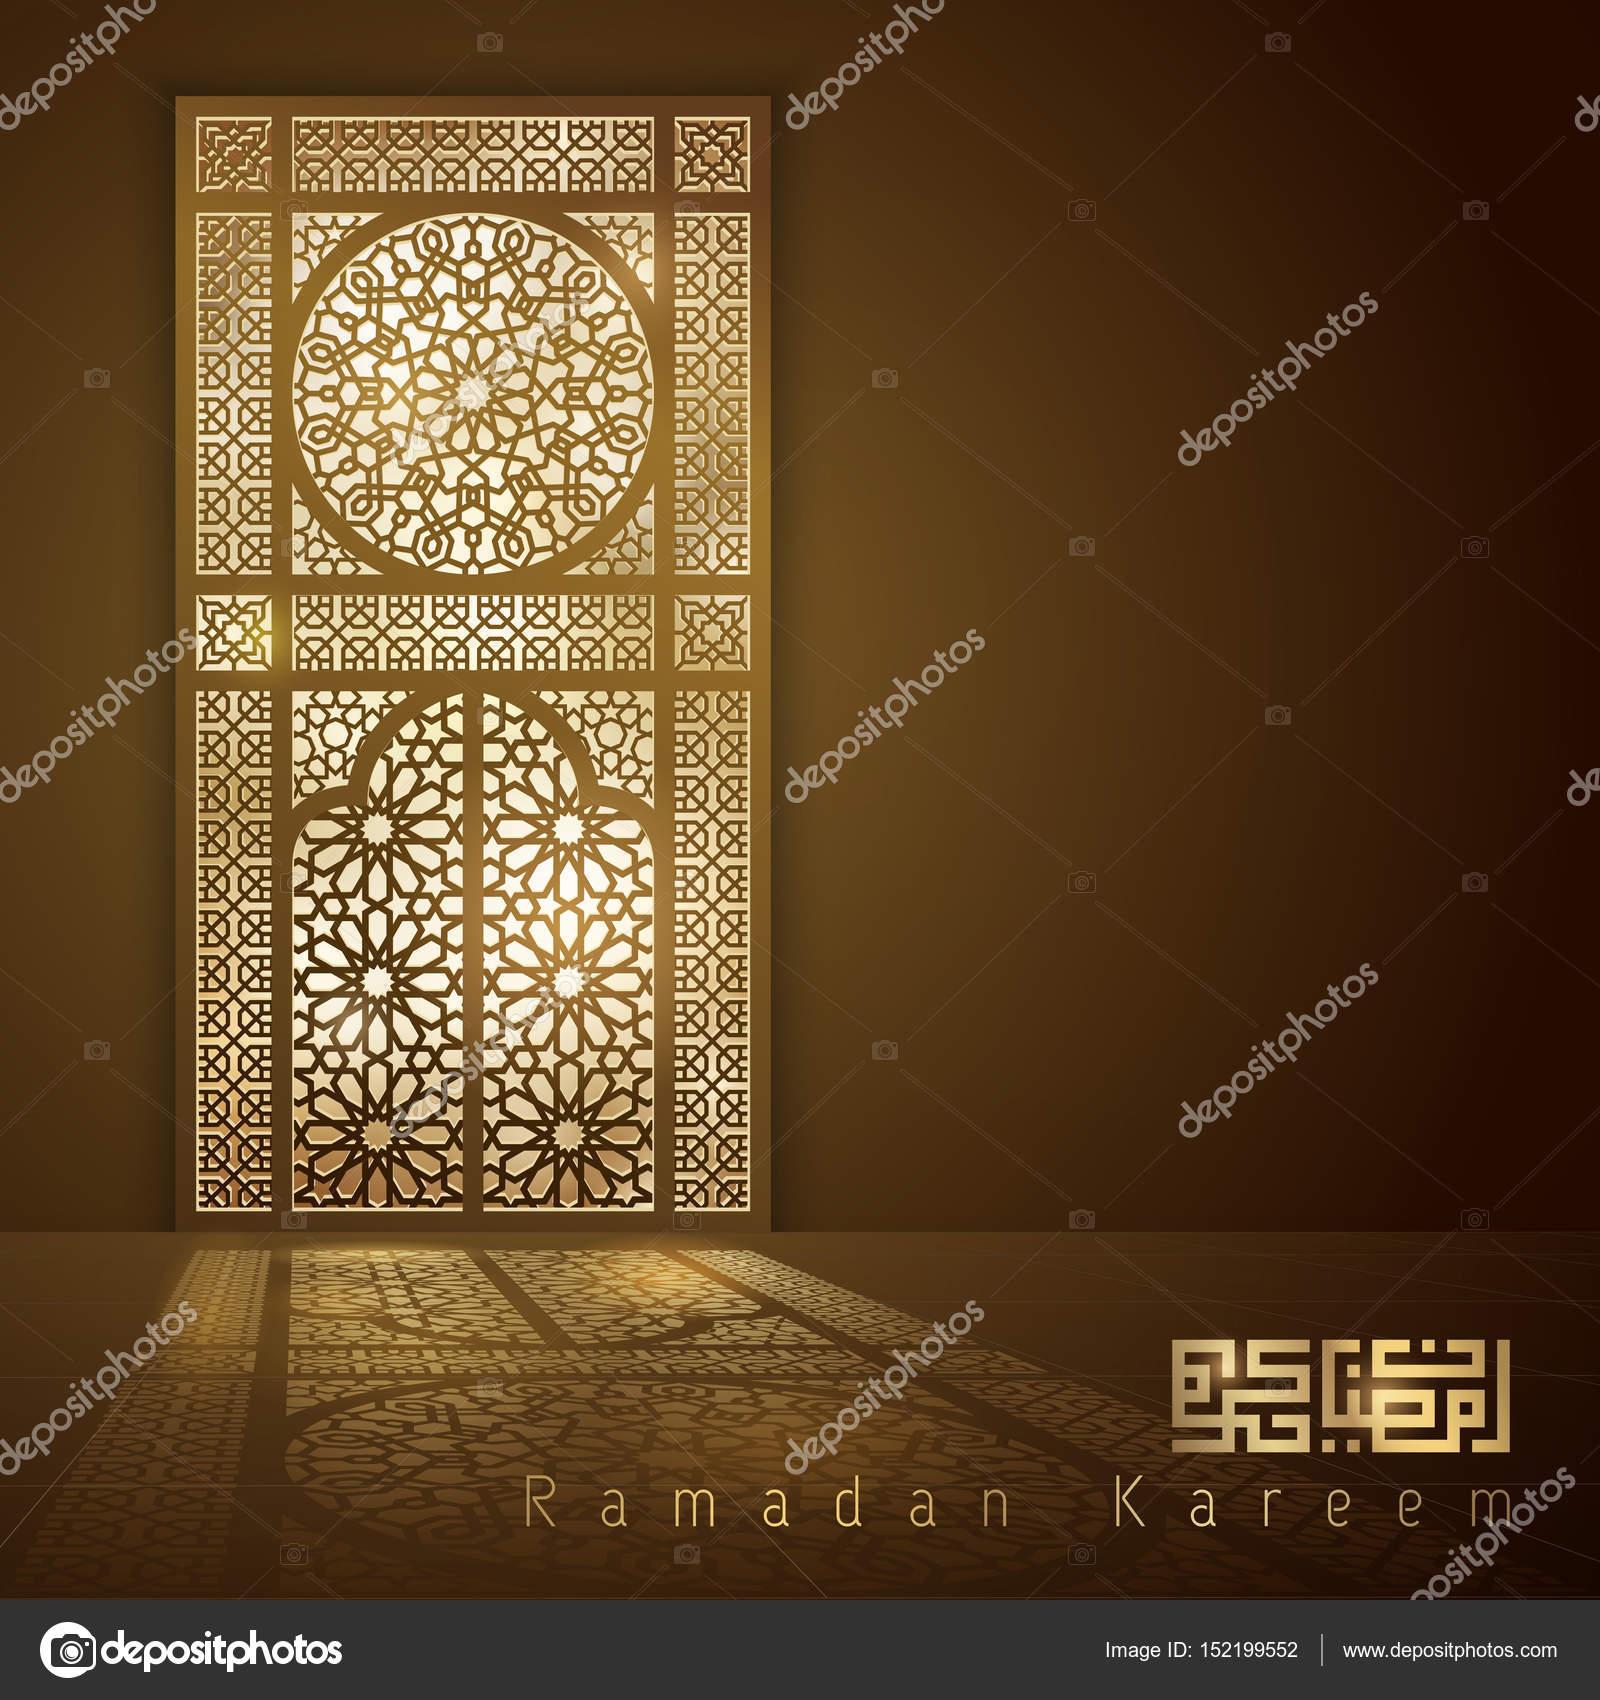 Ramadan kareem islamic mosque door \u2014 Stock Vector  sc 1 st  Depositphotos & Ramadan kareem islamic mosque door \u2014 Stock Vector © Oktora #152199552